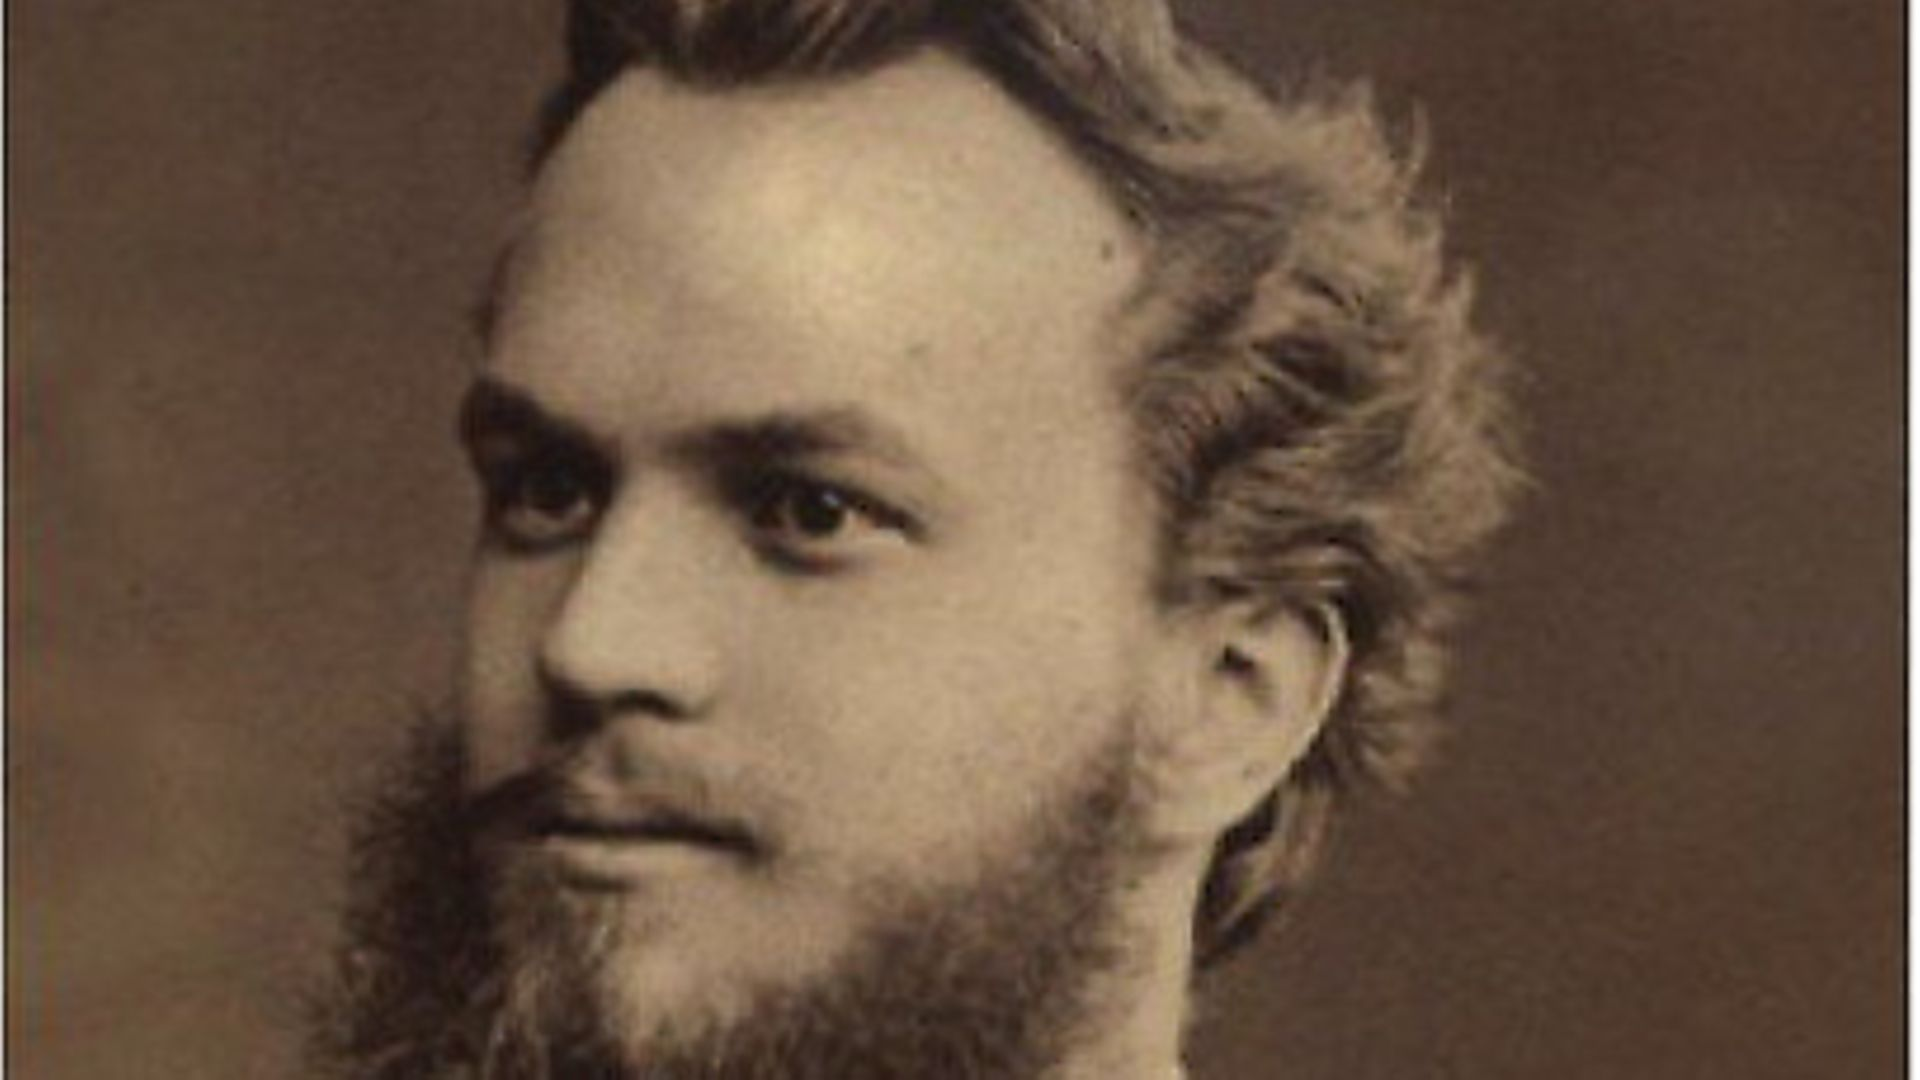 Czech historian Josef Konstantin Jirecek. - Credit: Archant